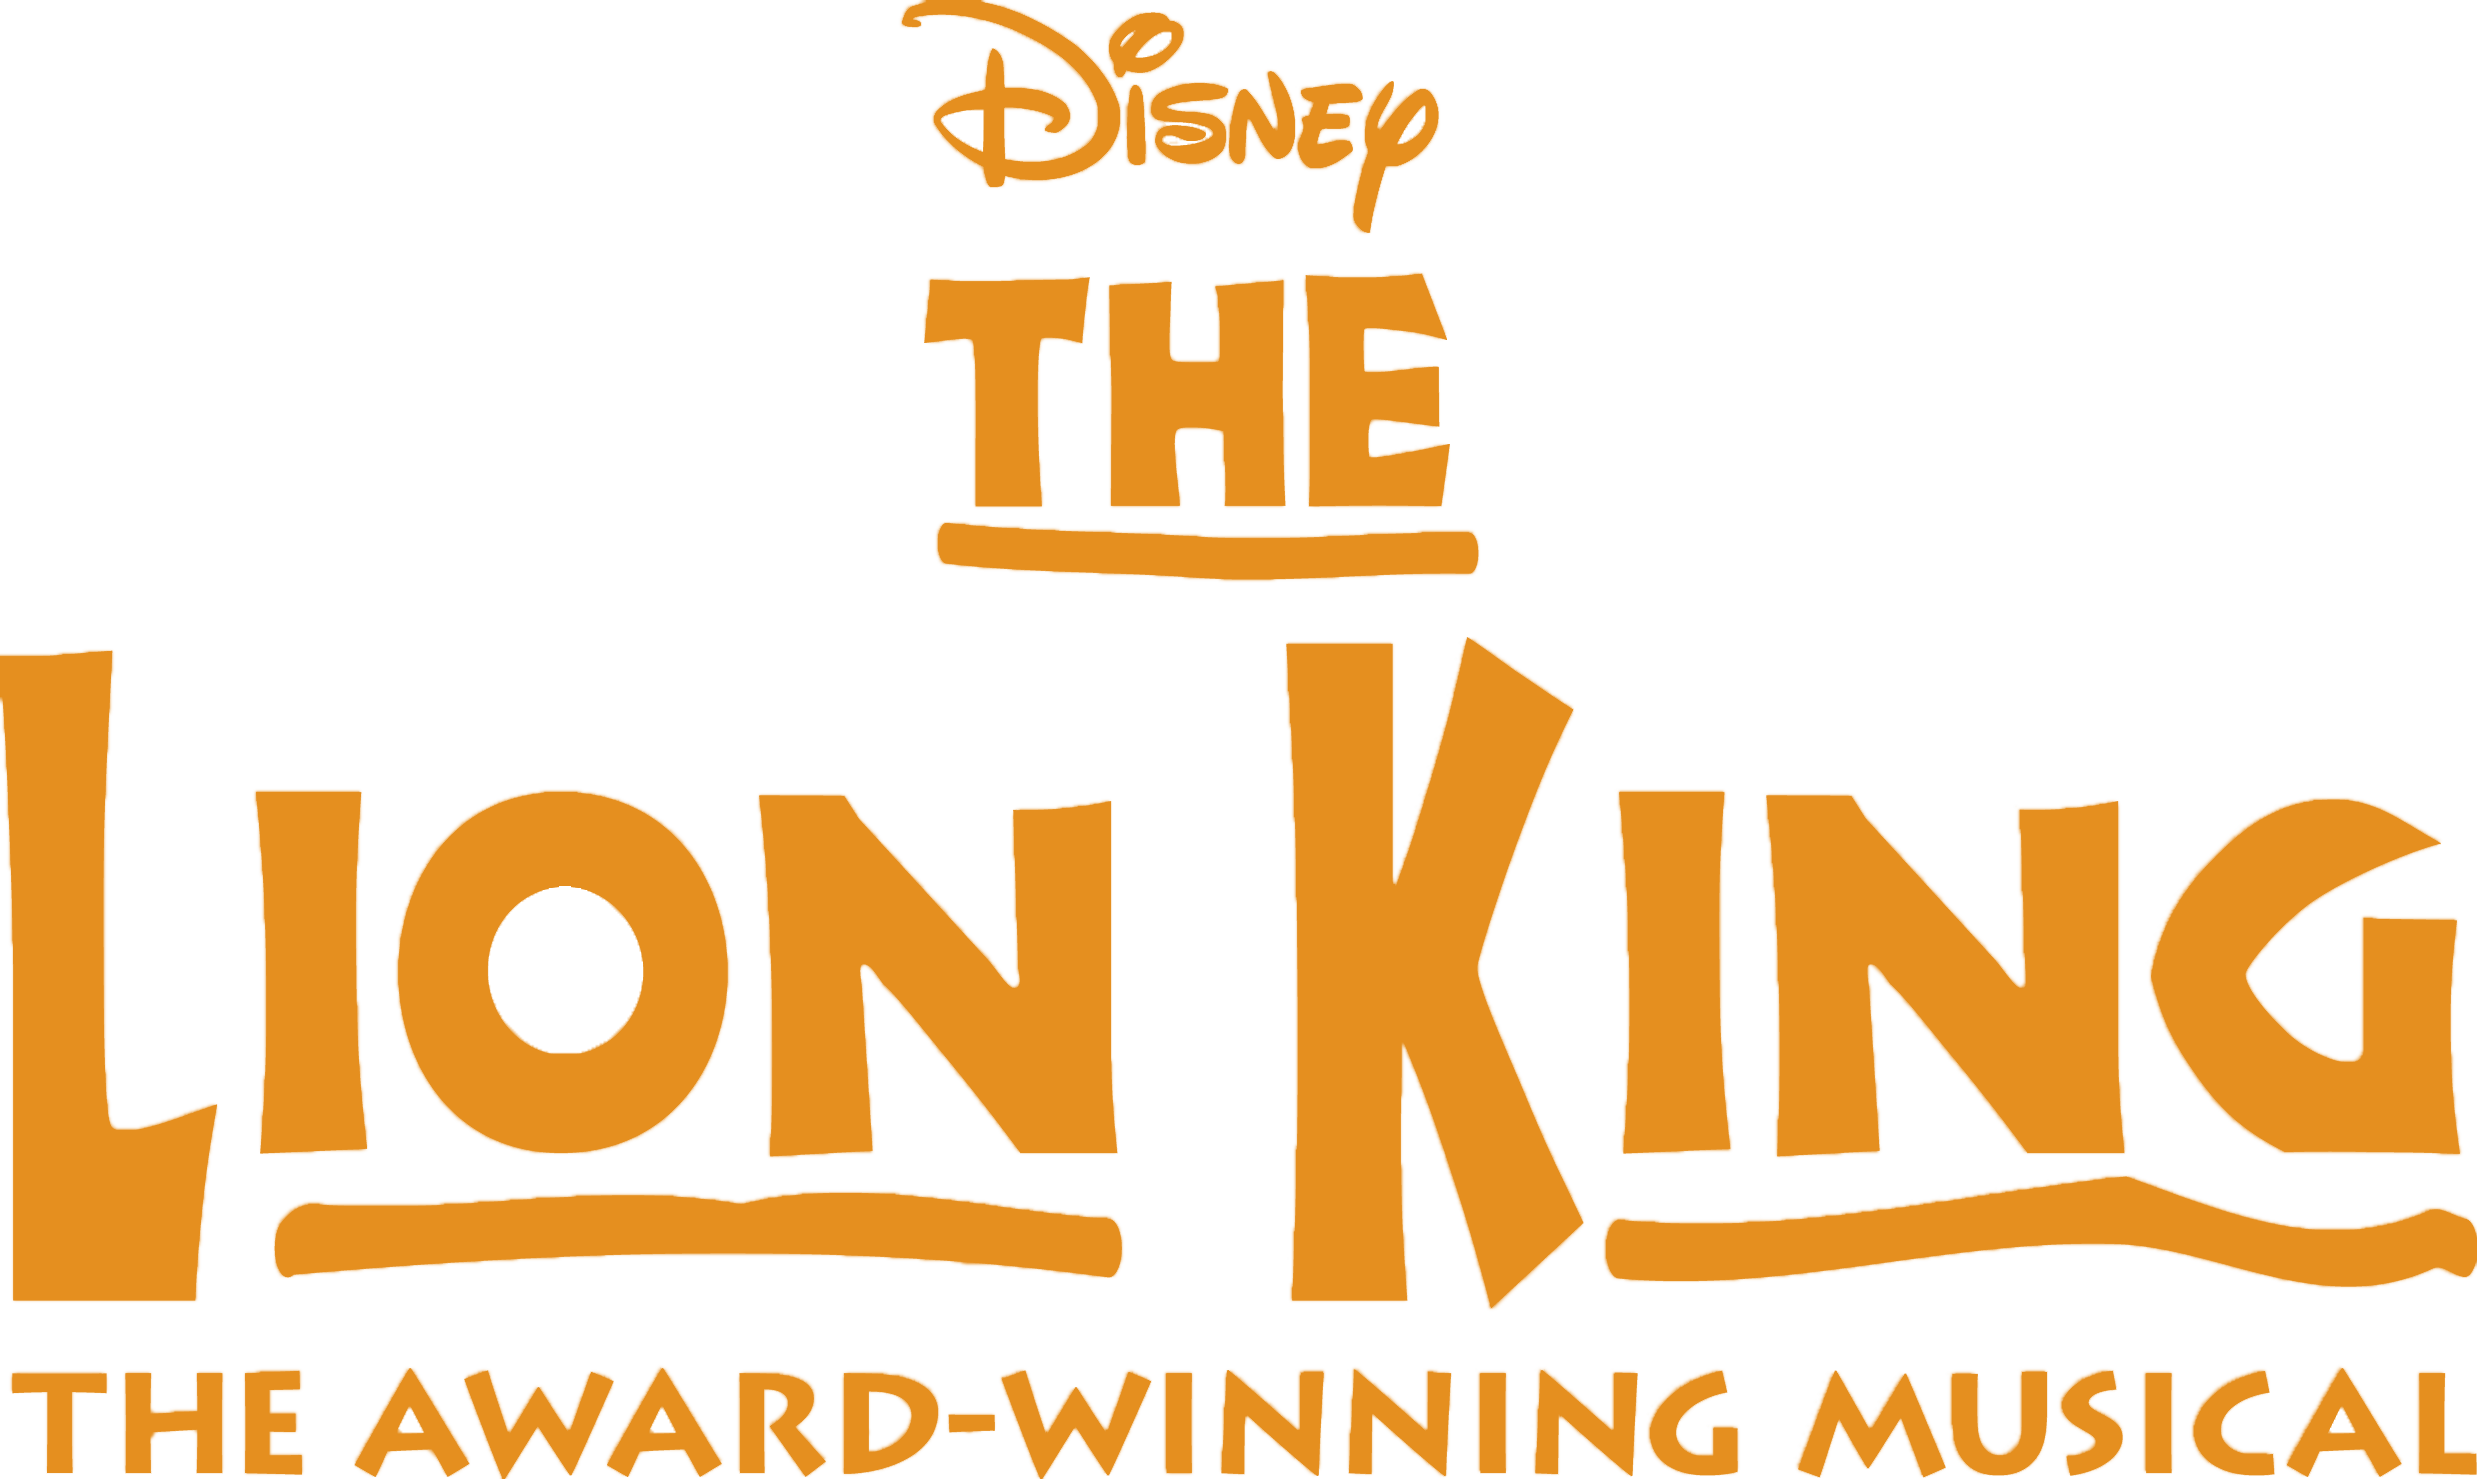 lion king.png